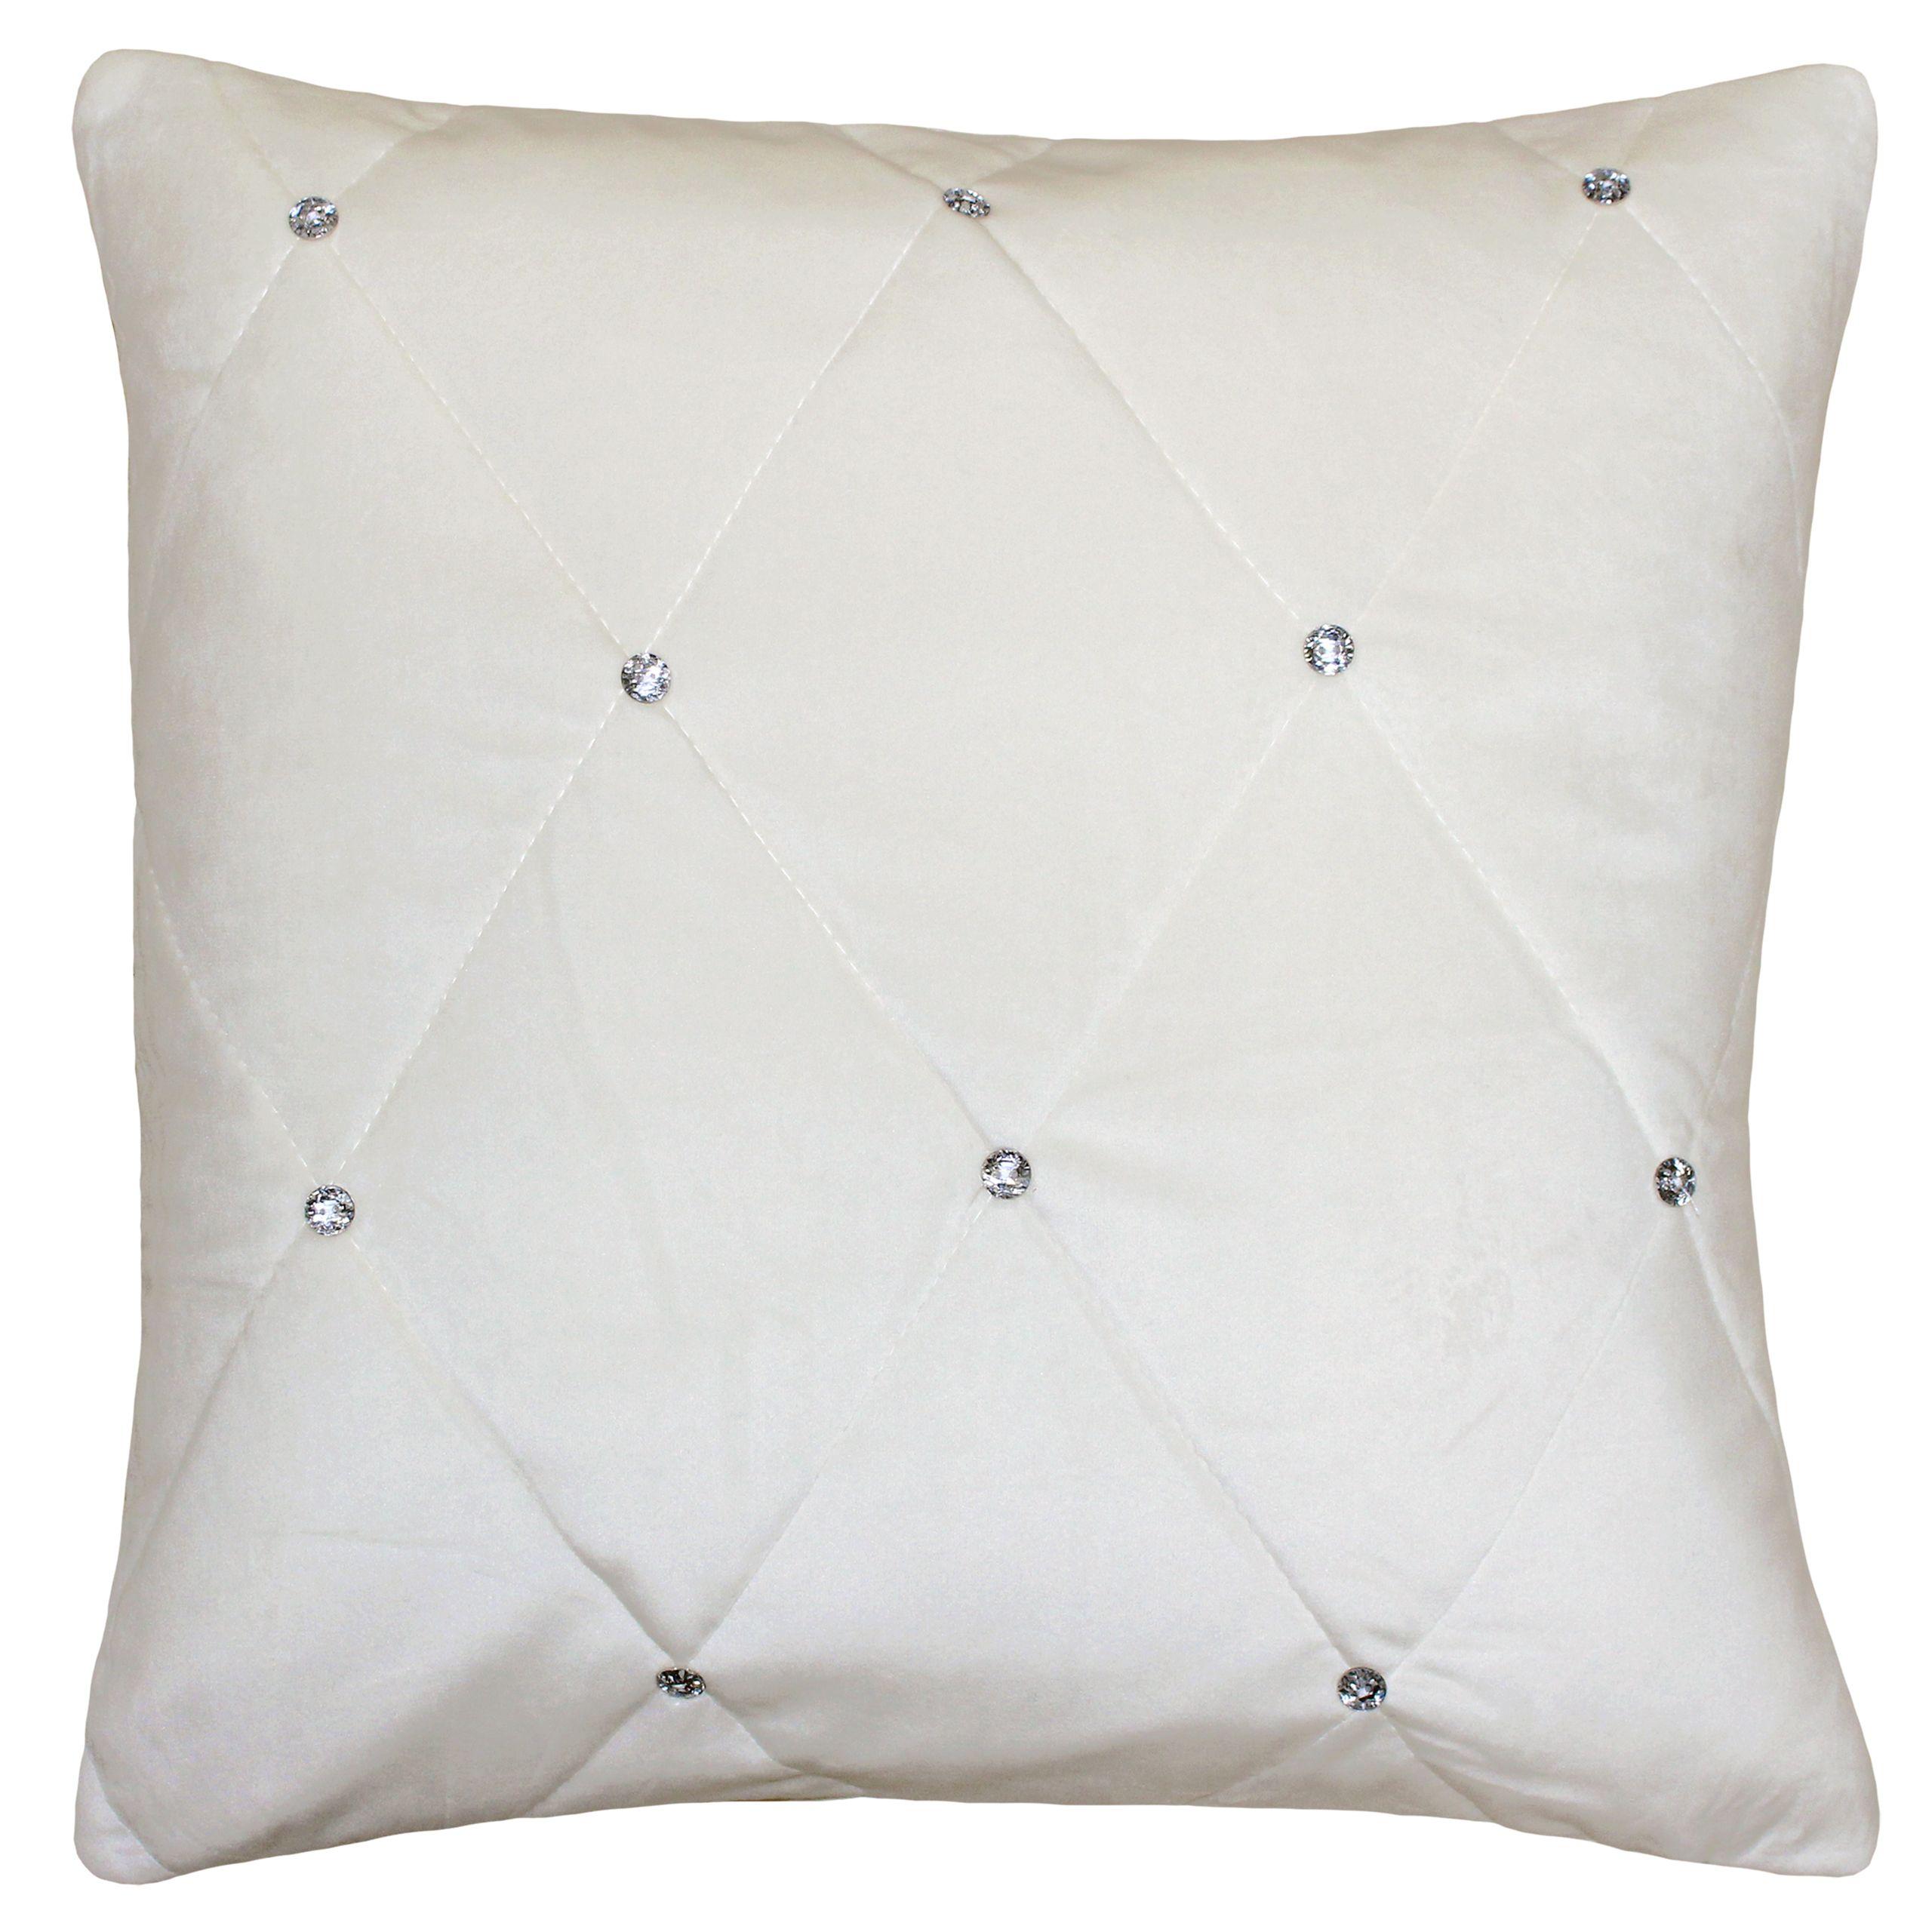 New Diamante Poly Cushion 55X55 Cre